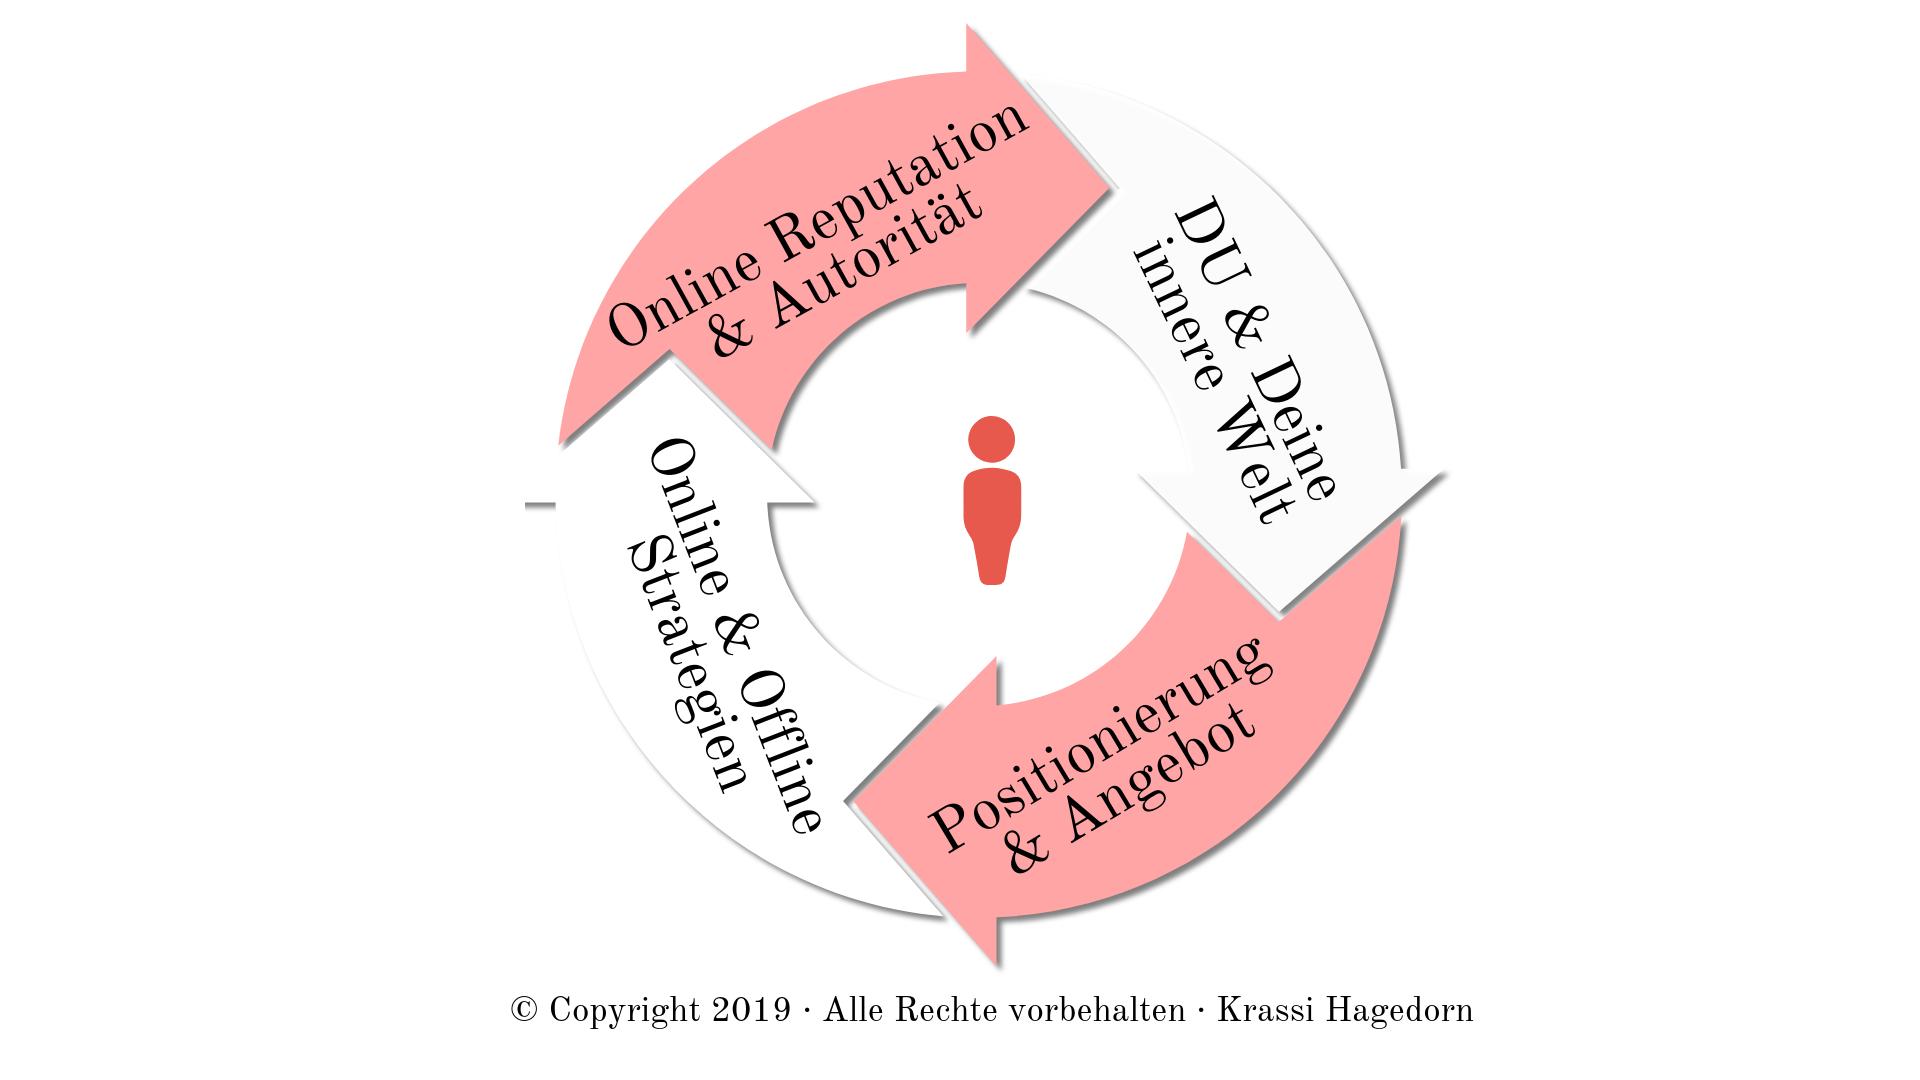 Personal Branding Krassi Hagedorn